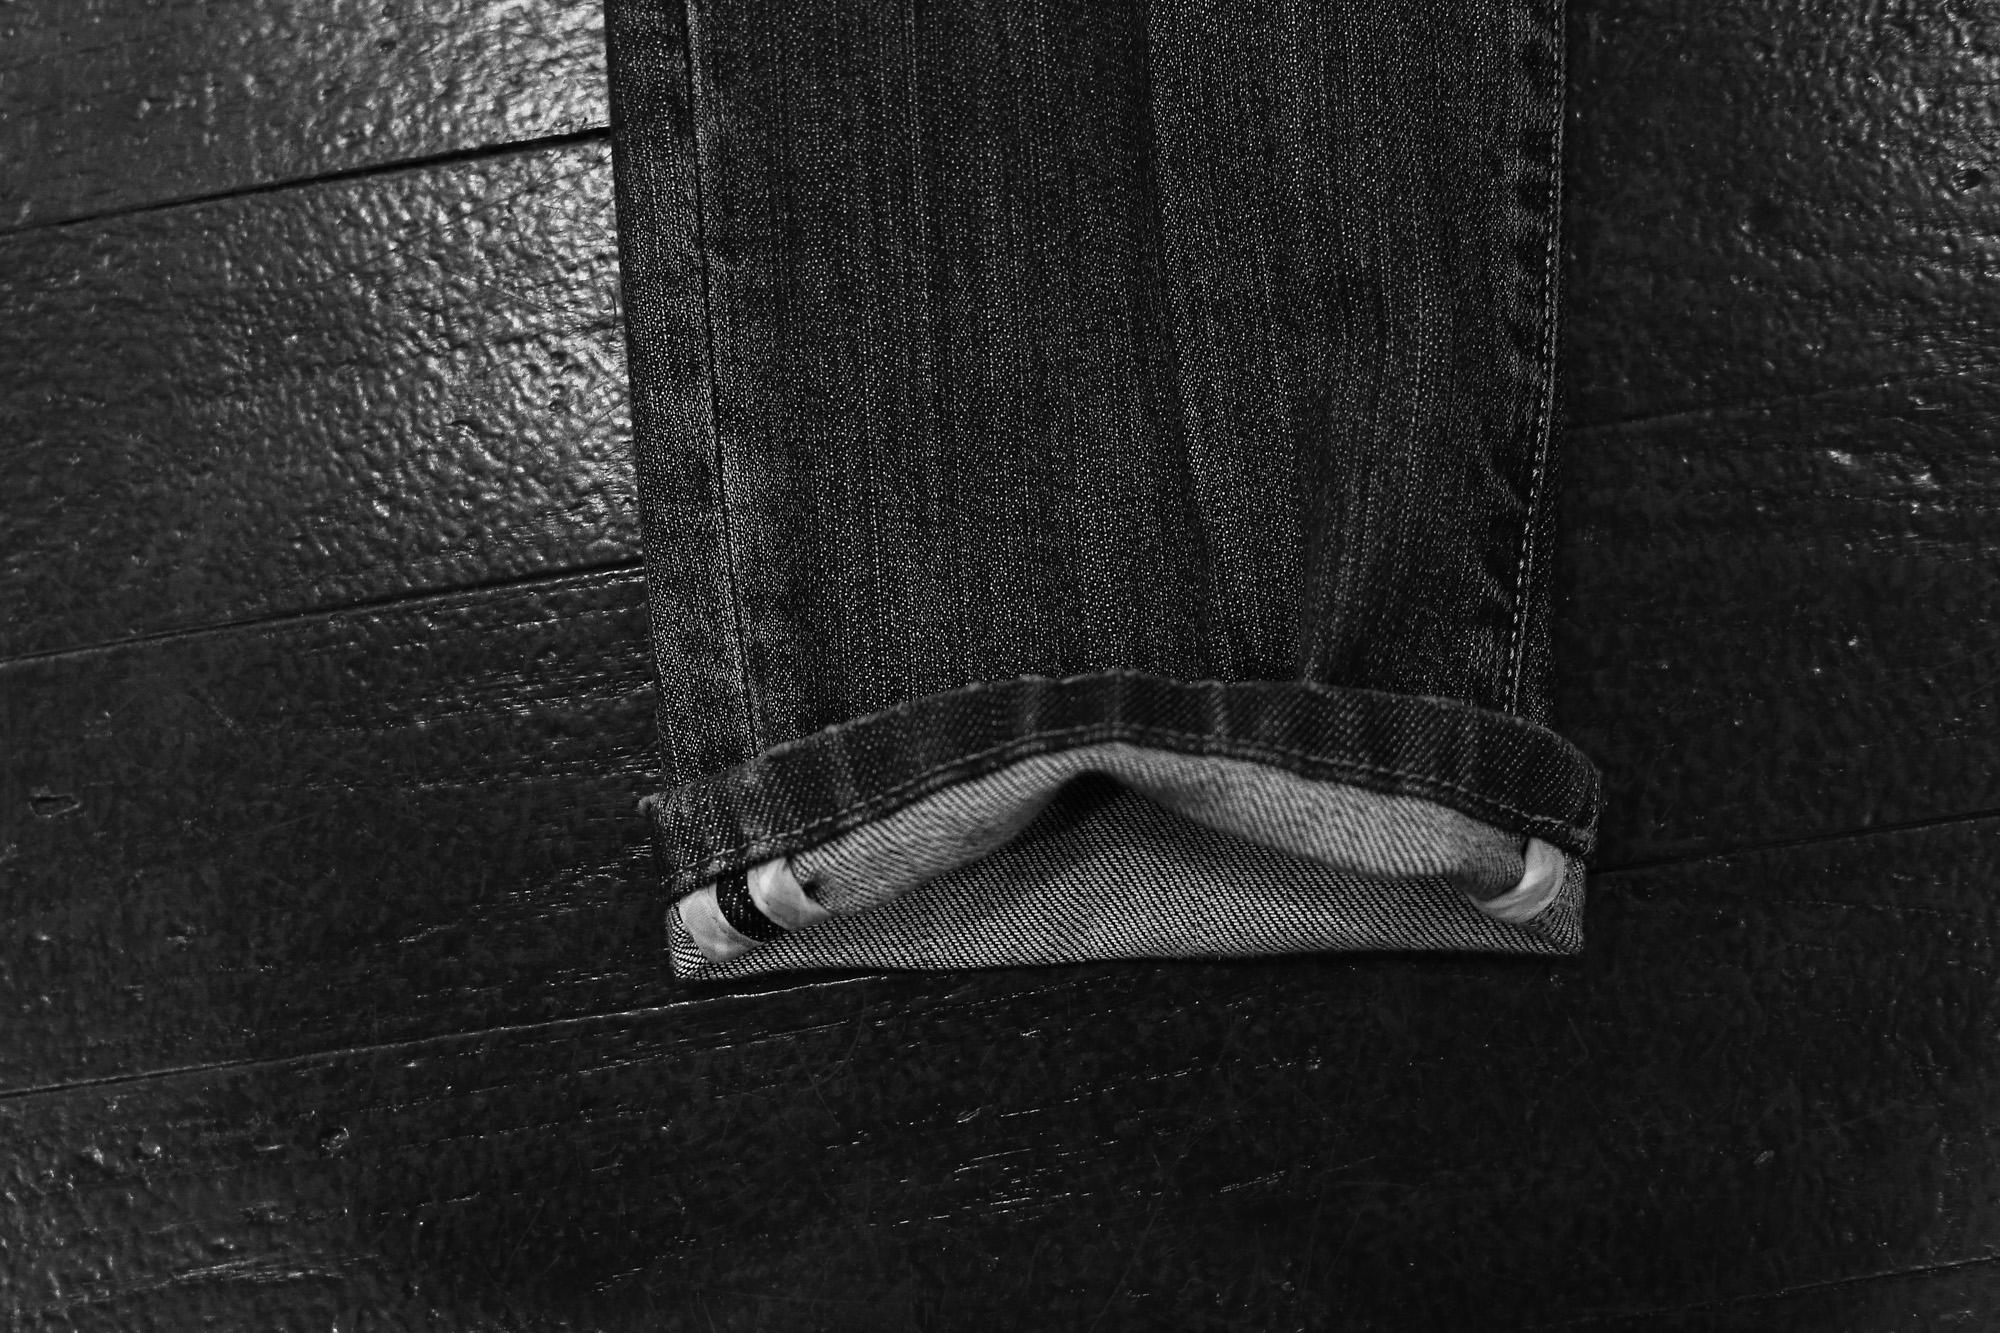 RICHARD J.BROWN / リチャードジェイブラウン (2017 秋冬 展示会プレ) 愛知 名古屋 ZODIAC ゾディアック テーパードシルエット ストレッチジーンズ デザイナー